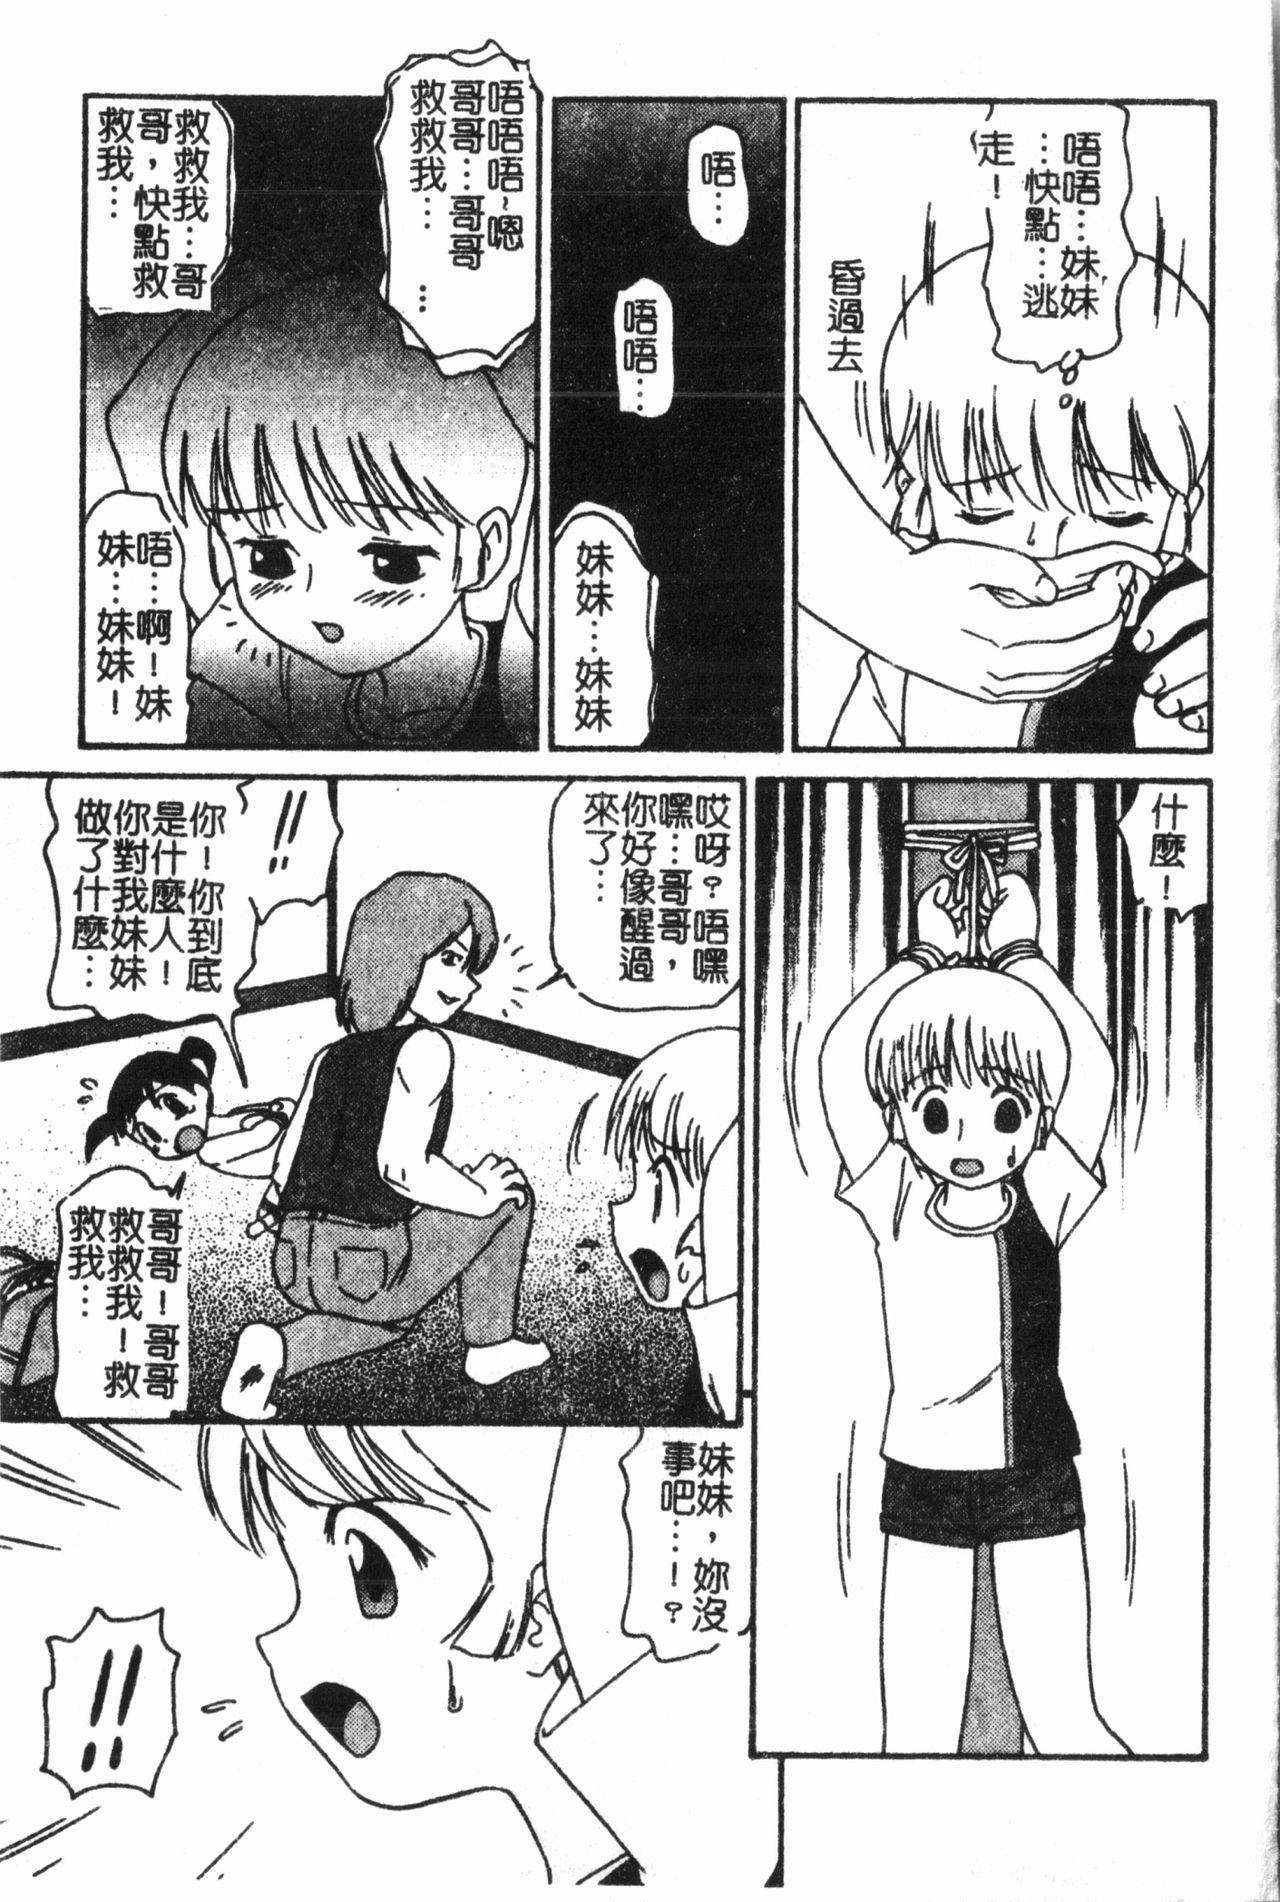 Imouto Koishi 6 7